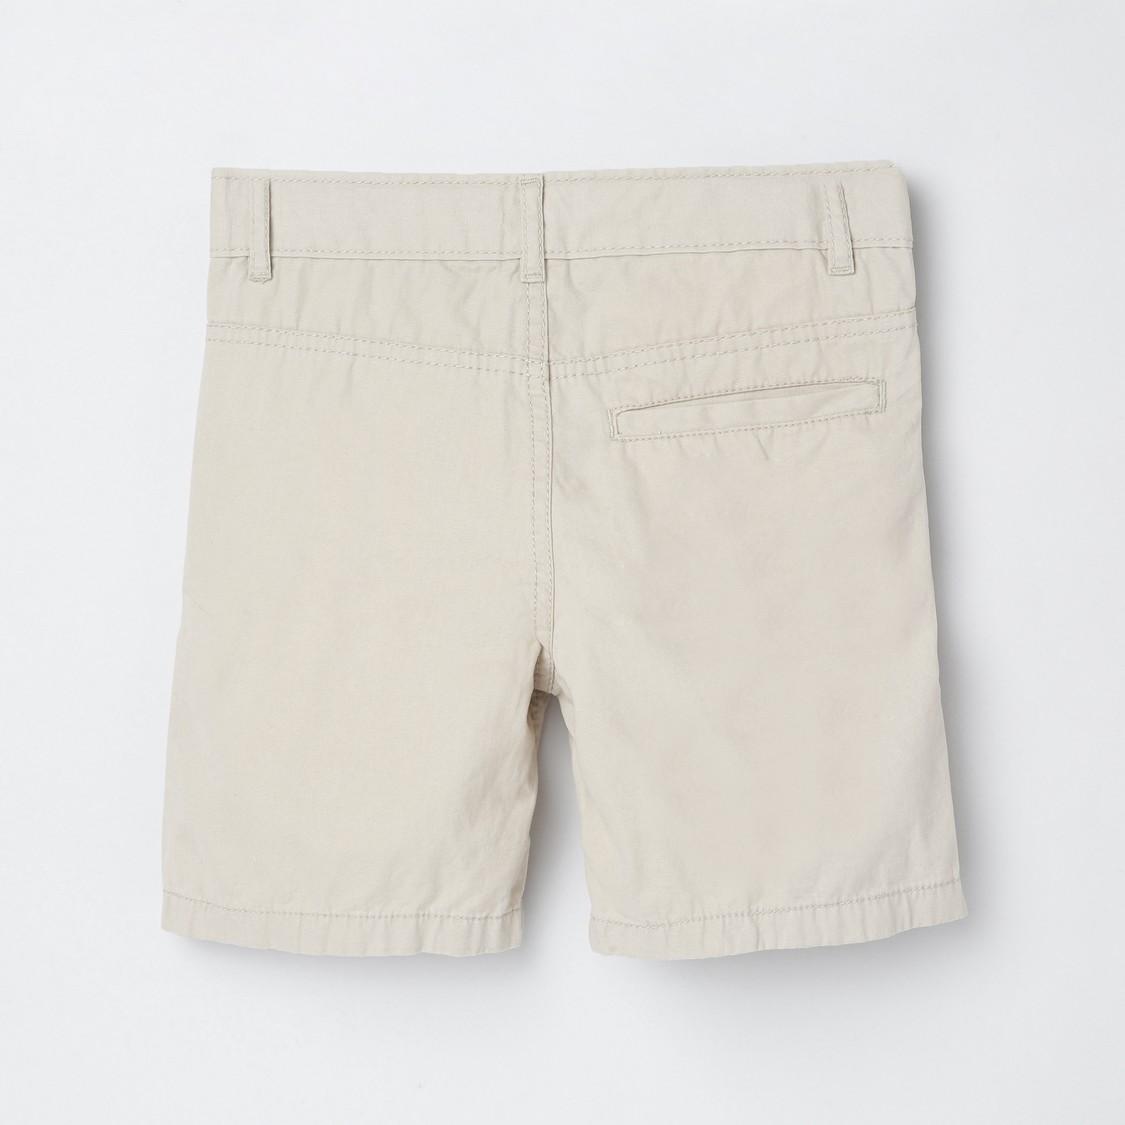 MAX Solid Regular Fit City Shorts